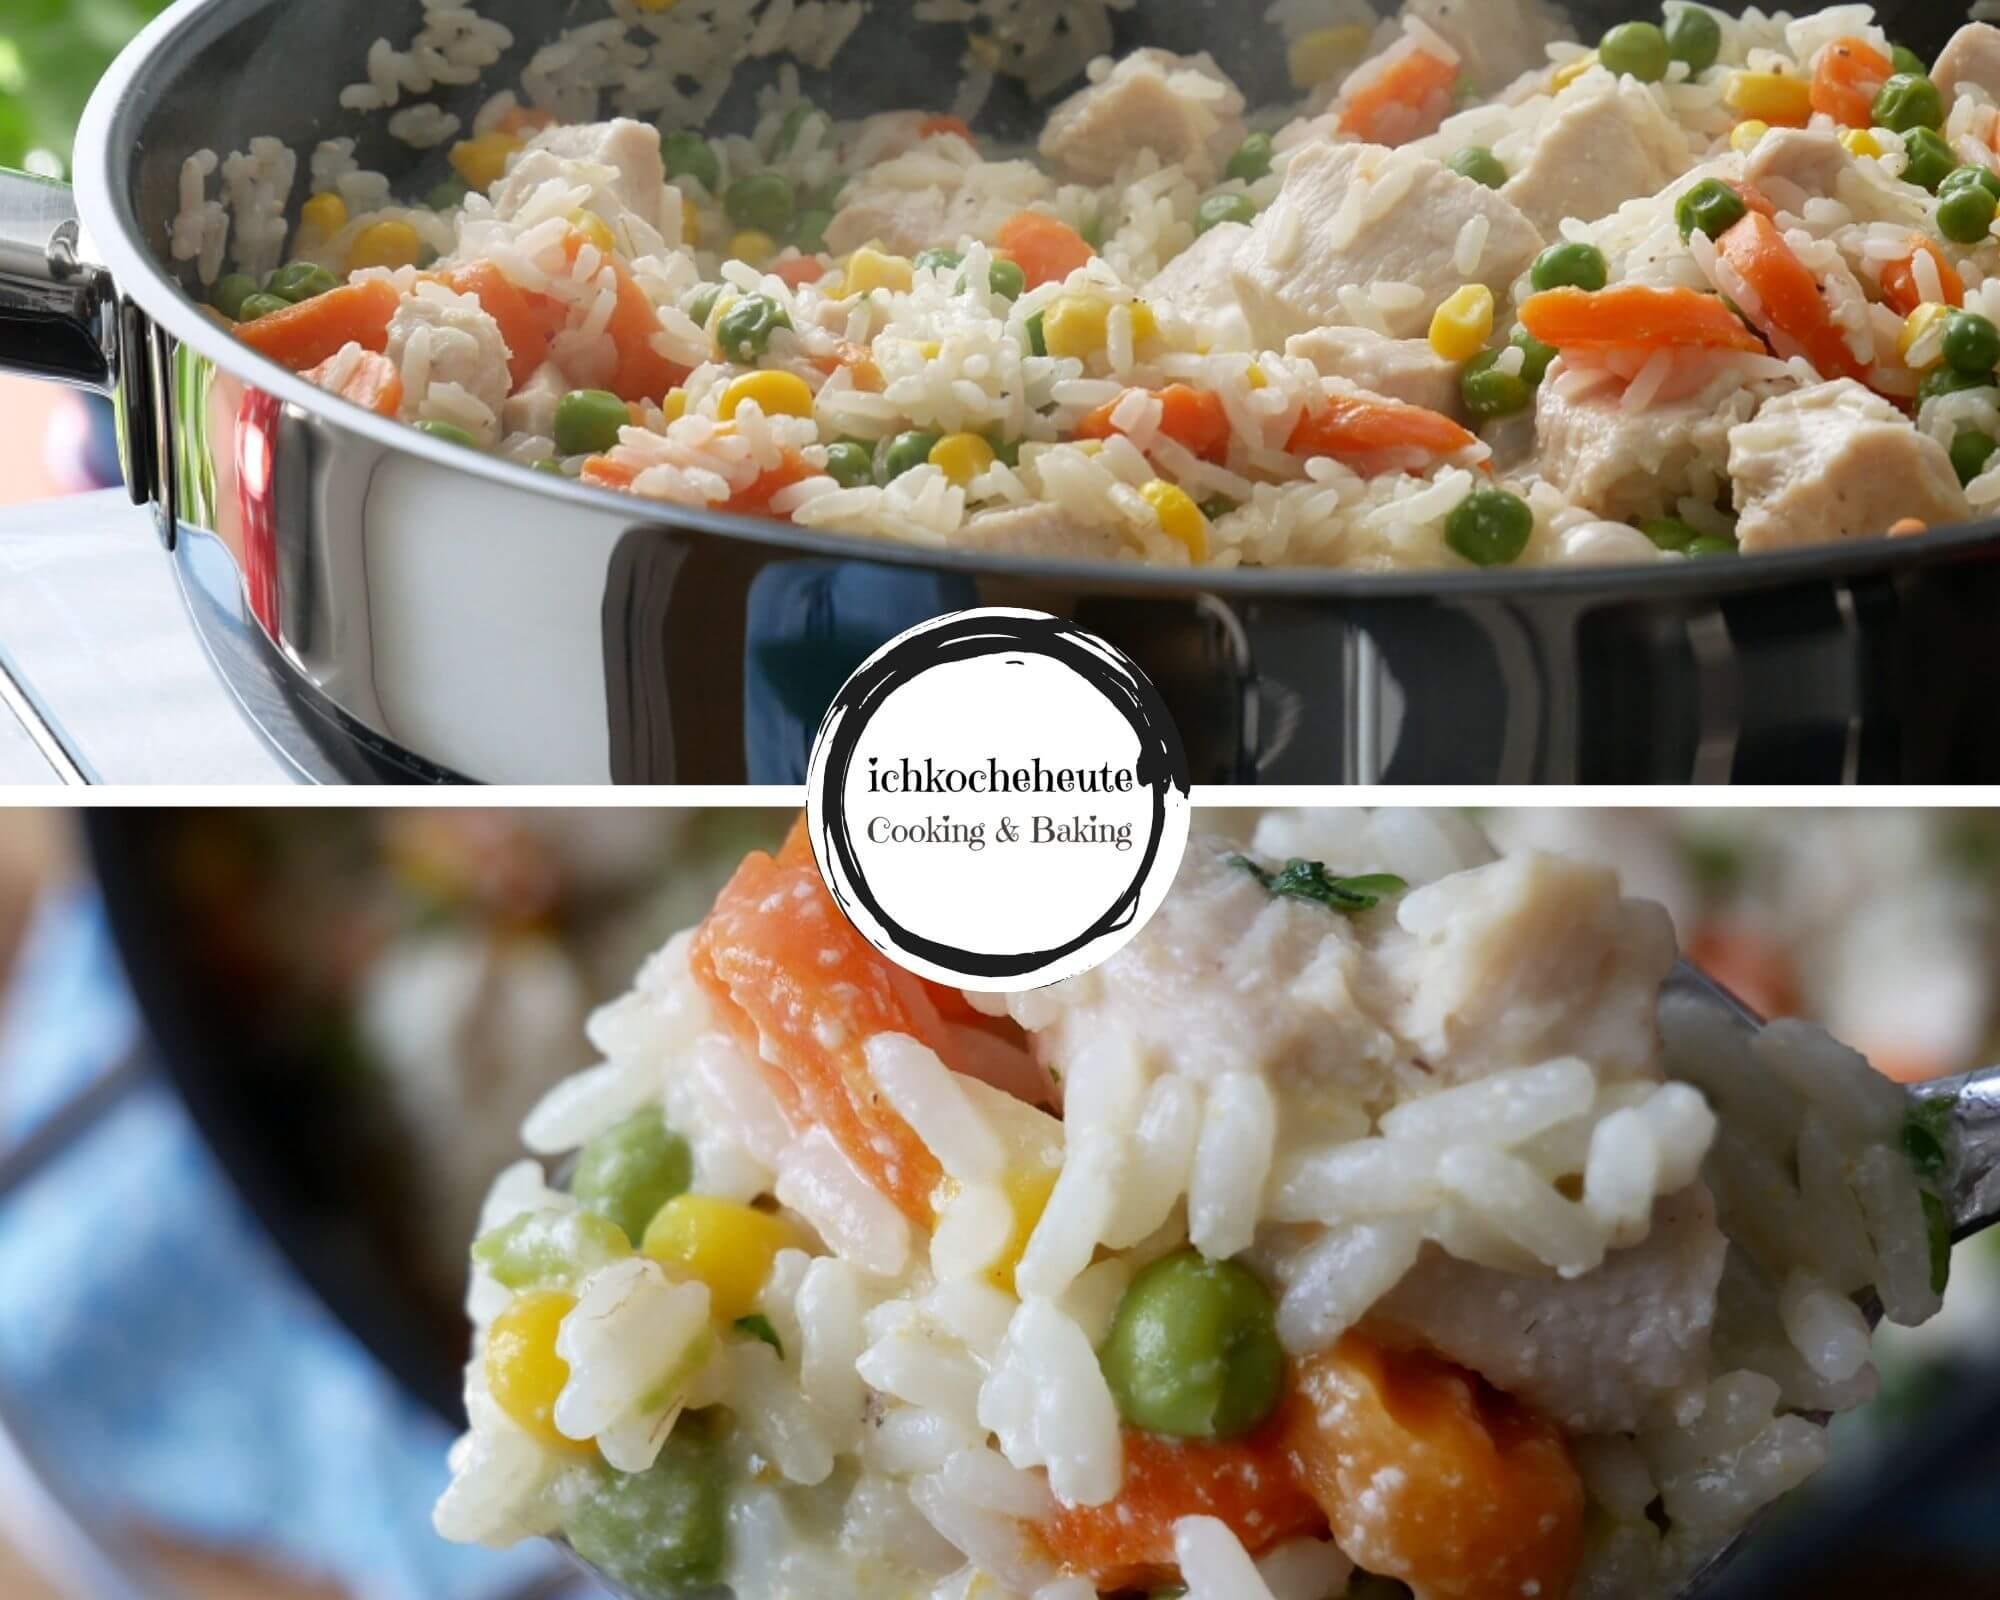 Serving One Pot Rice Stir Fry with Chicken & Veggies